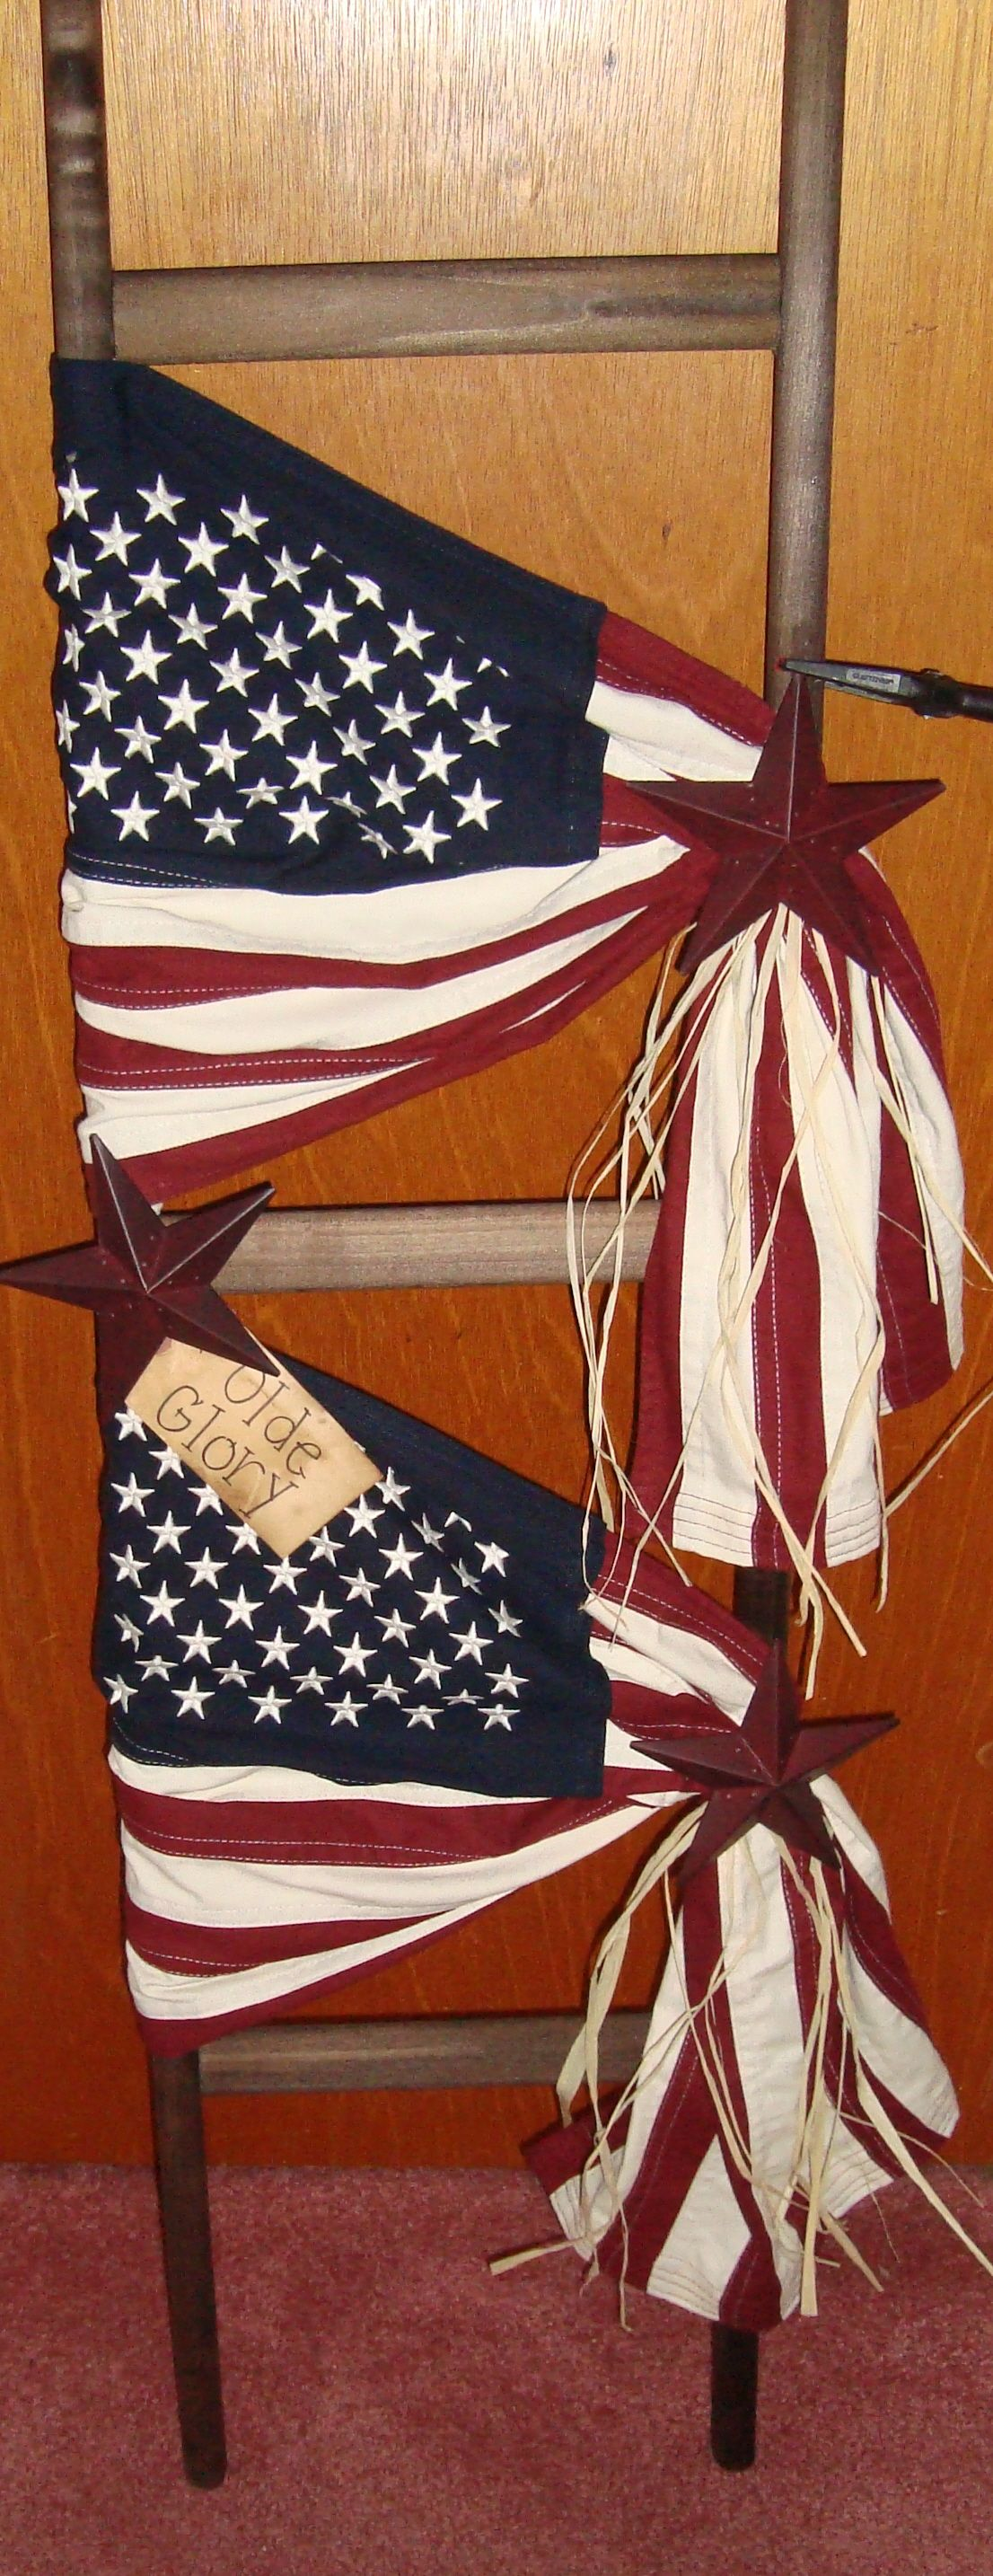 Pin By Kordelia Stevens On Kork S Corner Crafts Flag Decor Americana Crafts Fourth Of July Decor